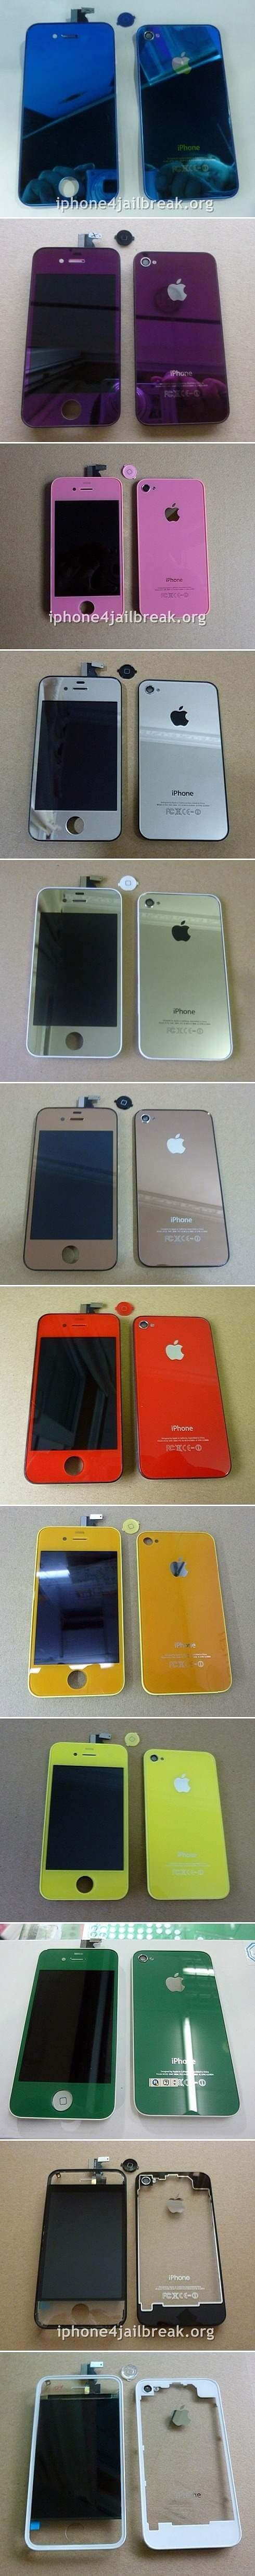 iphone 4 case colors